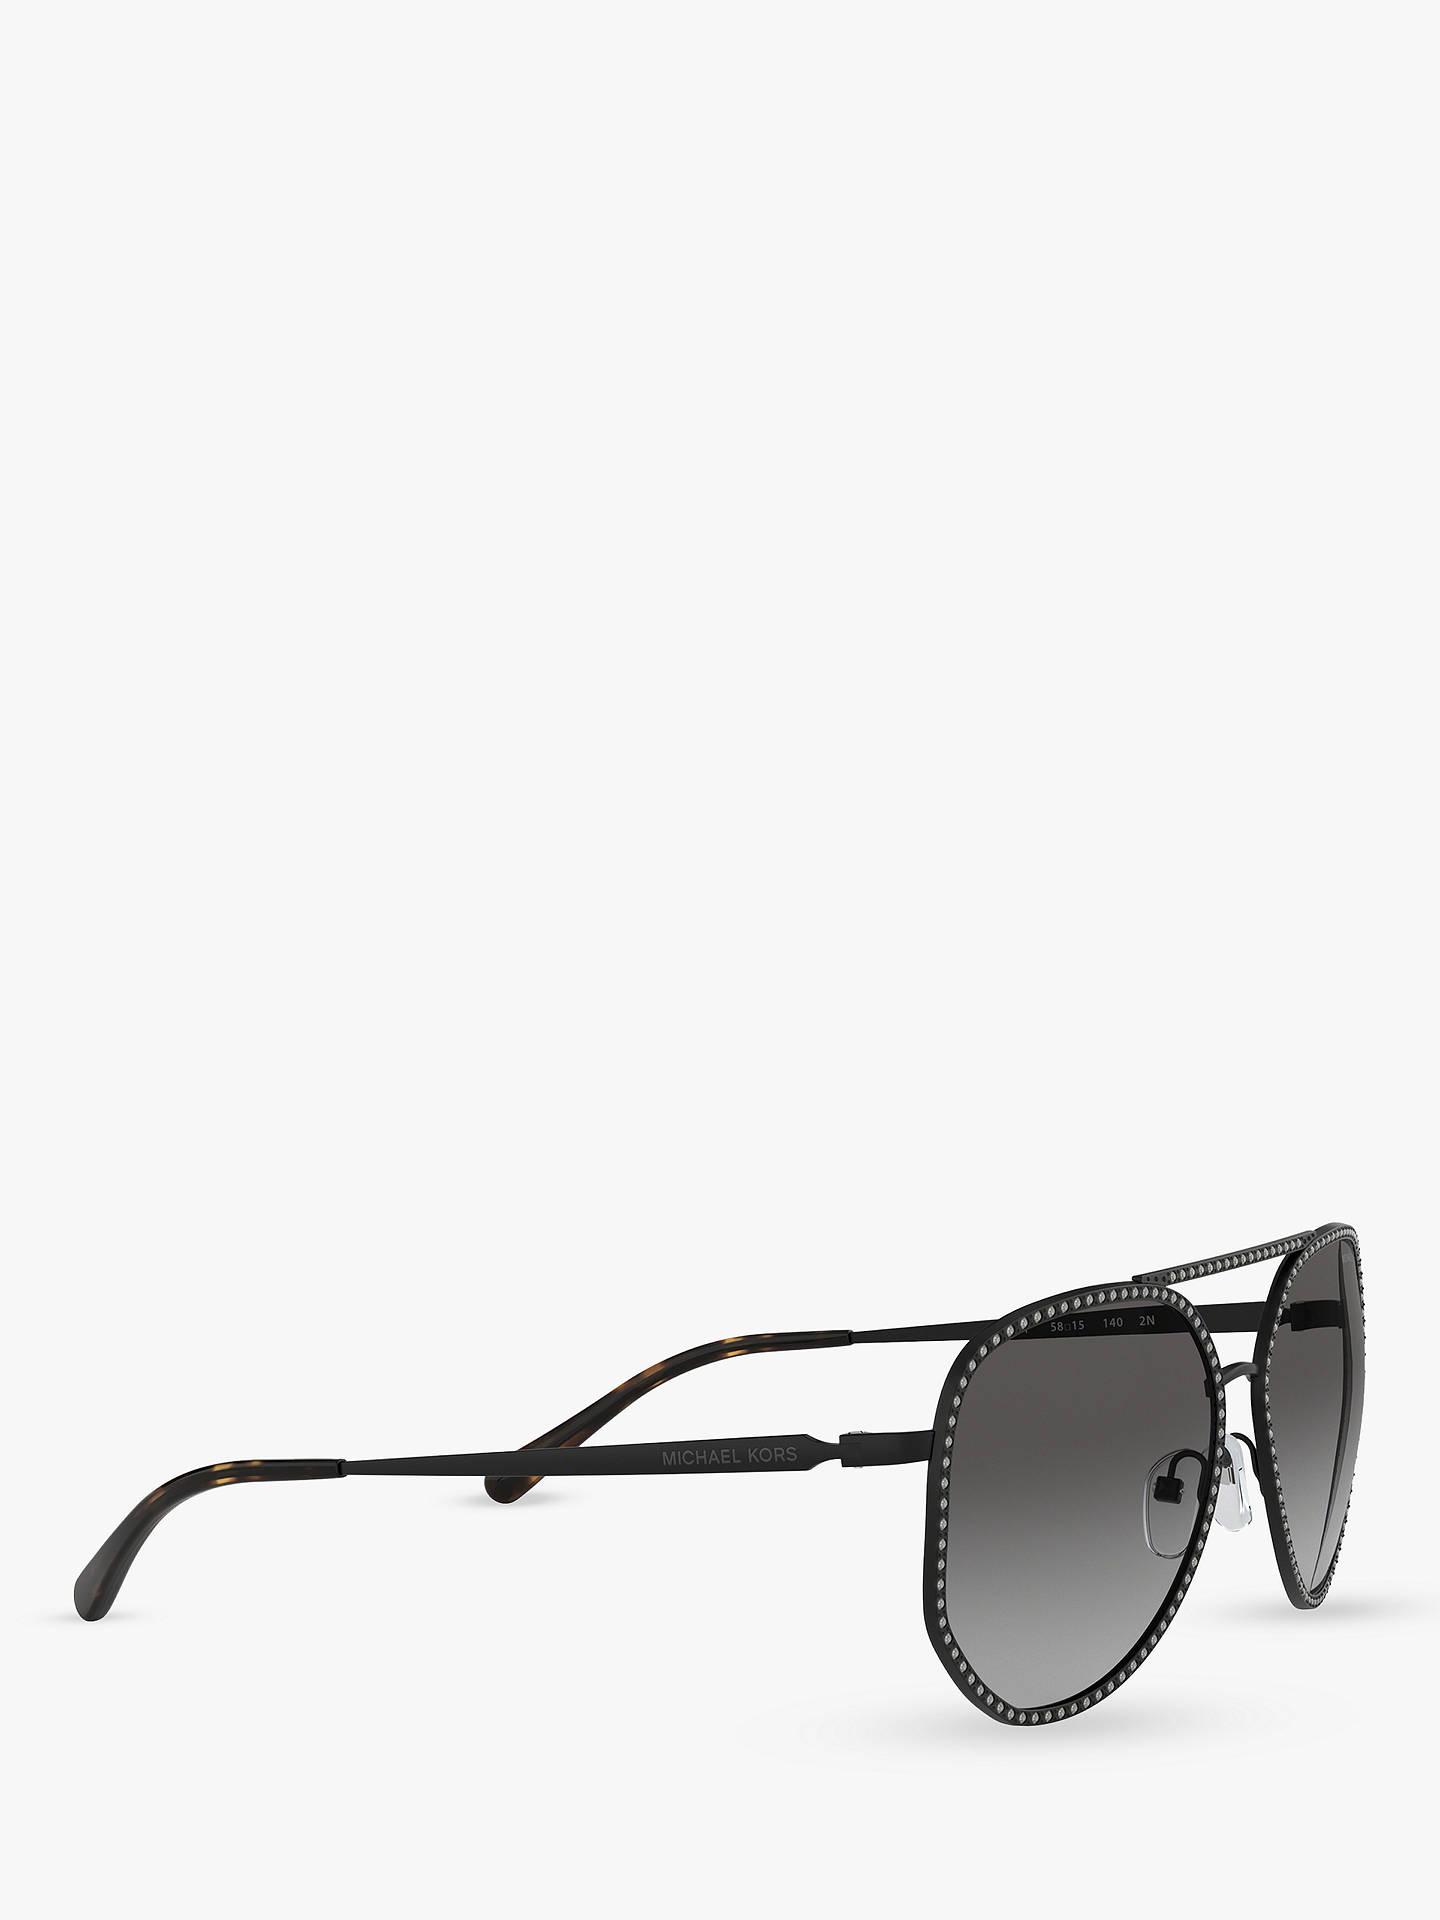 5325d1ae2 ... Buy Michael Kors MK1039B Women's Miami Sunglasses, Matte Black/Grey  Gradient Online at johnlewis